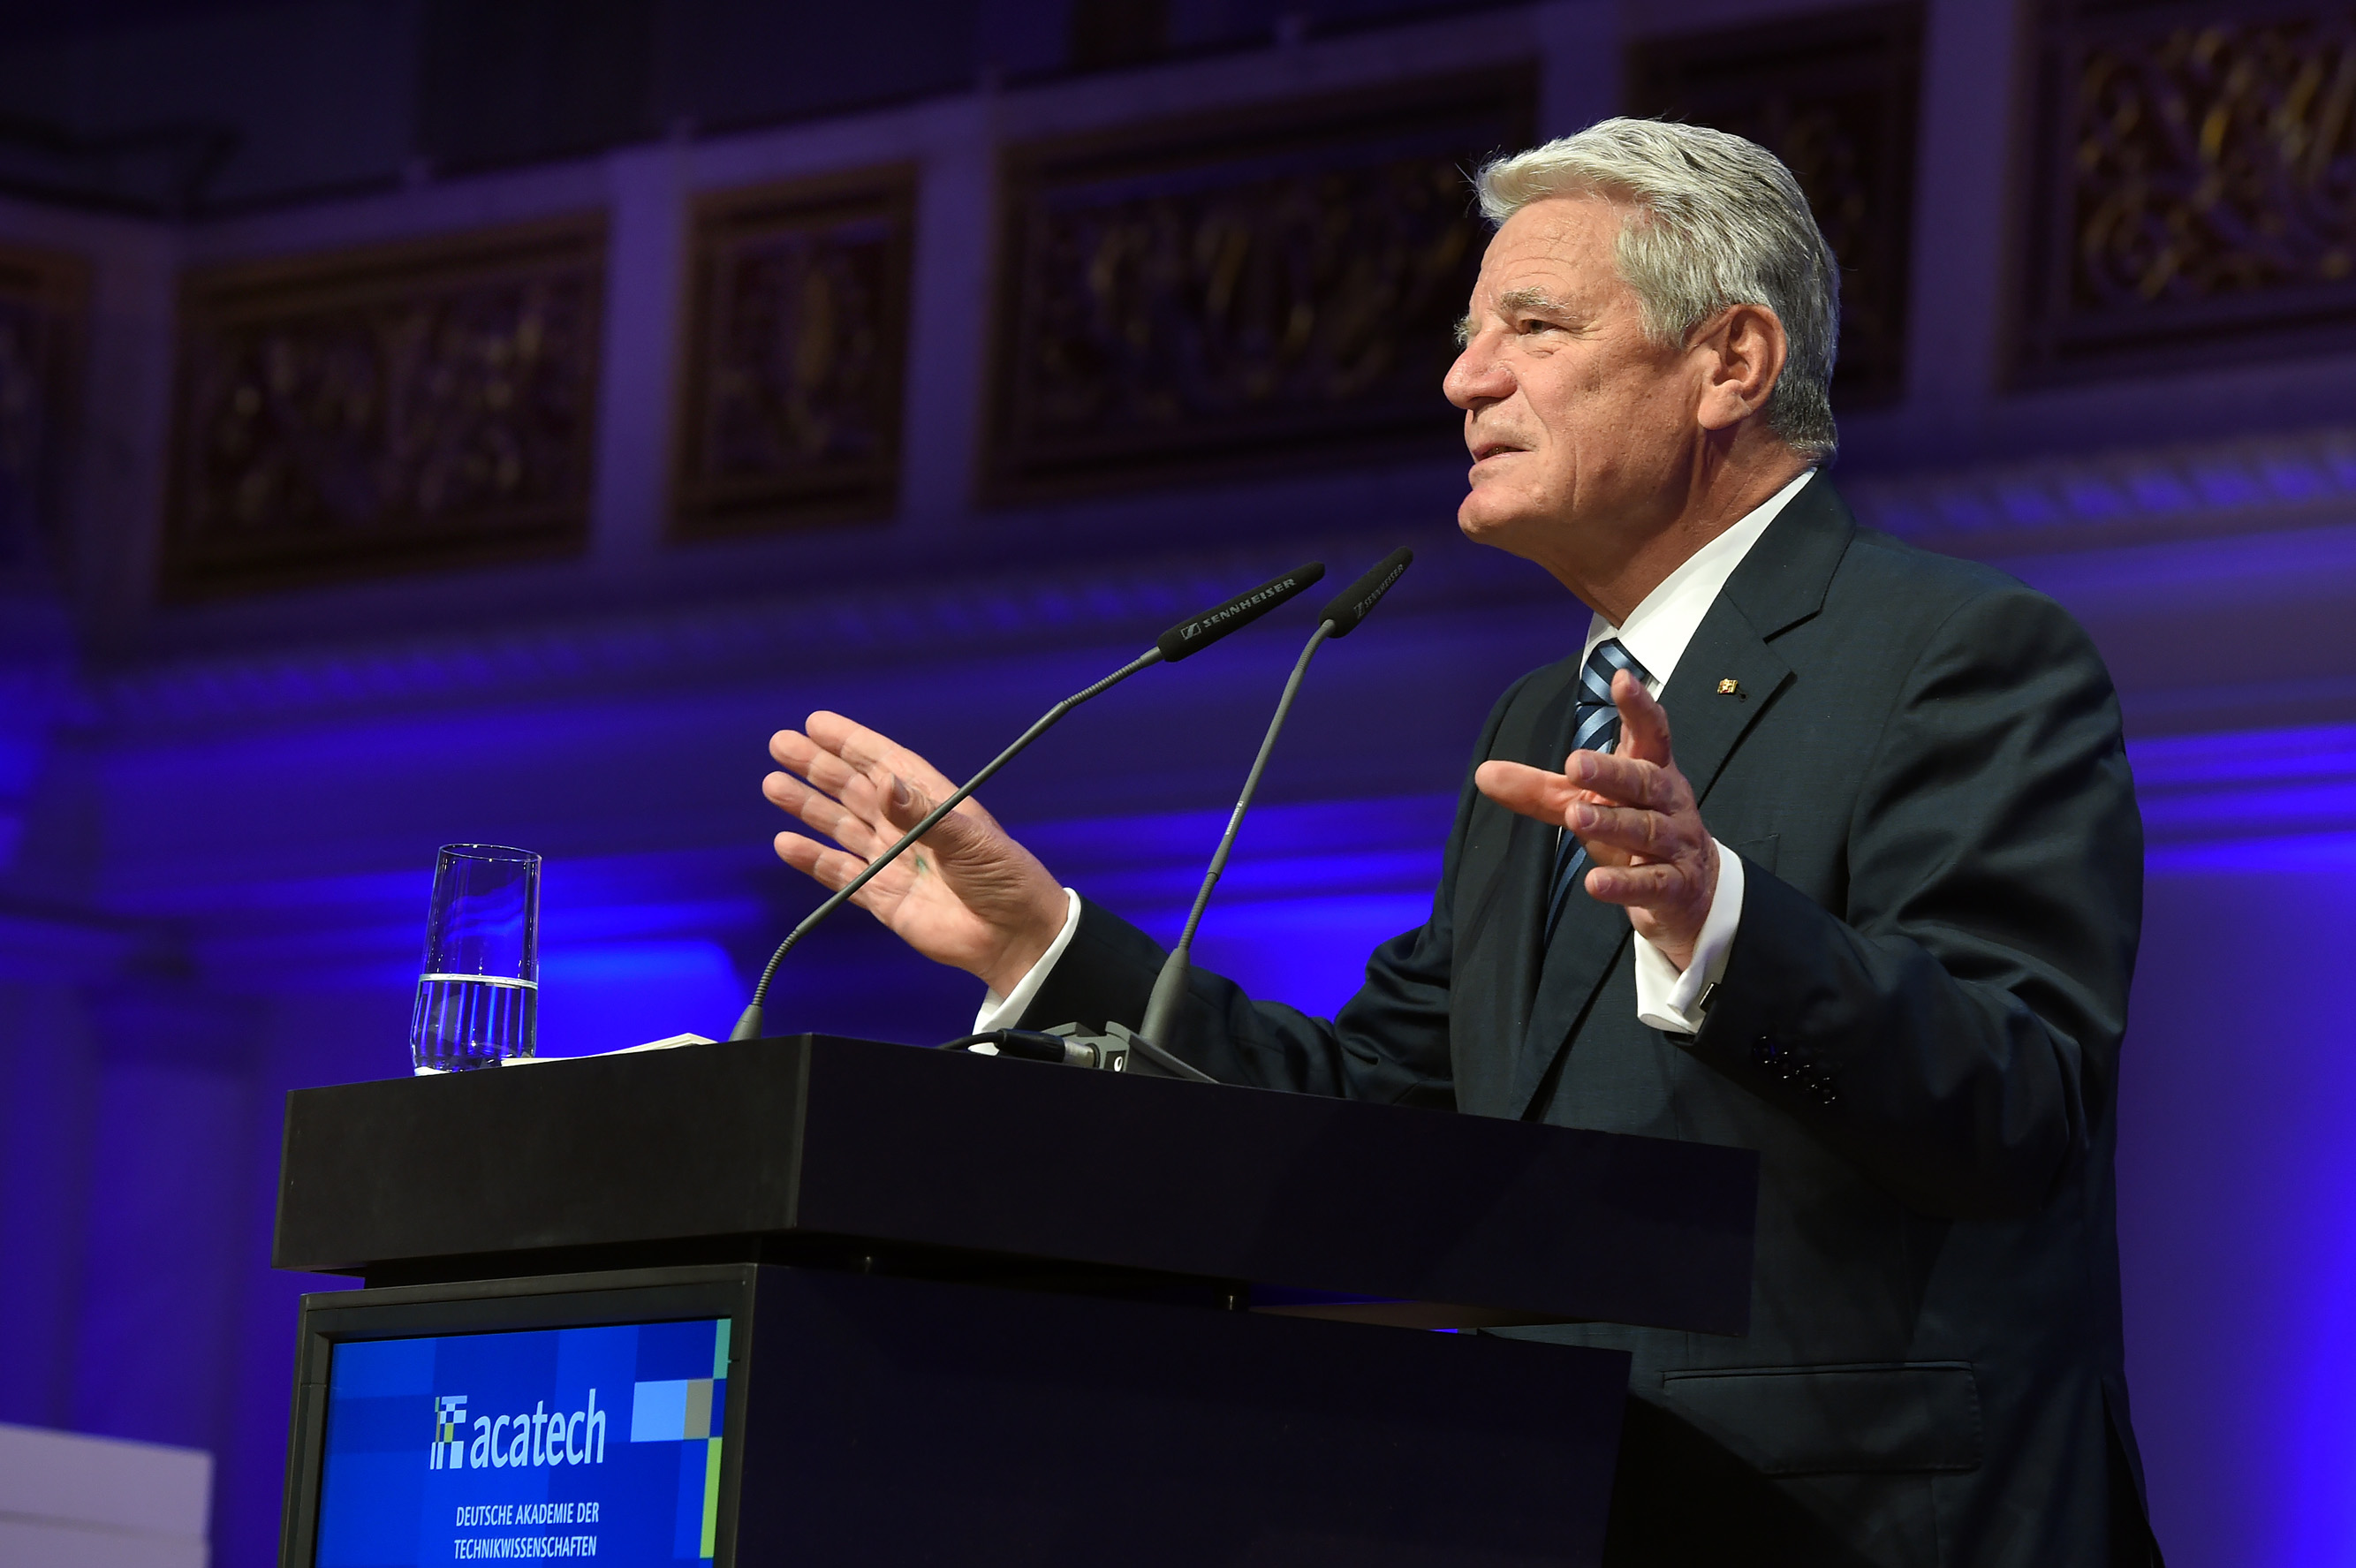 Bundespräsident a.D. Joachim Gauck spricht auf der acatech Festveranstaltung.